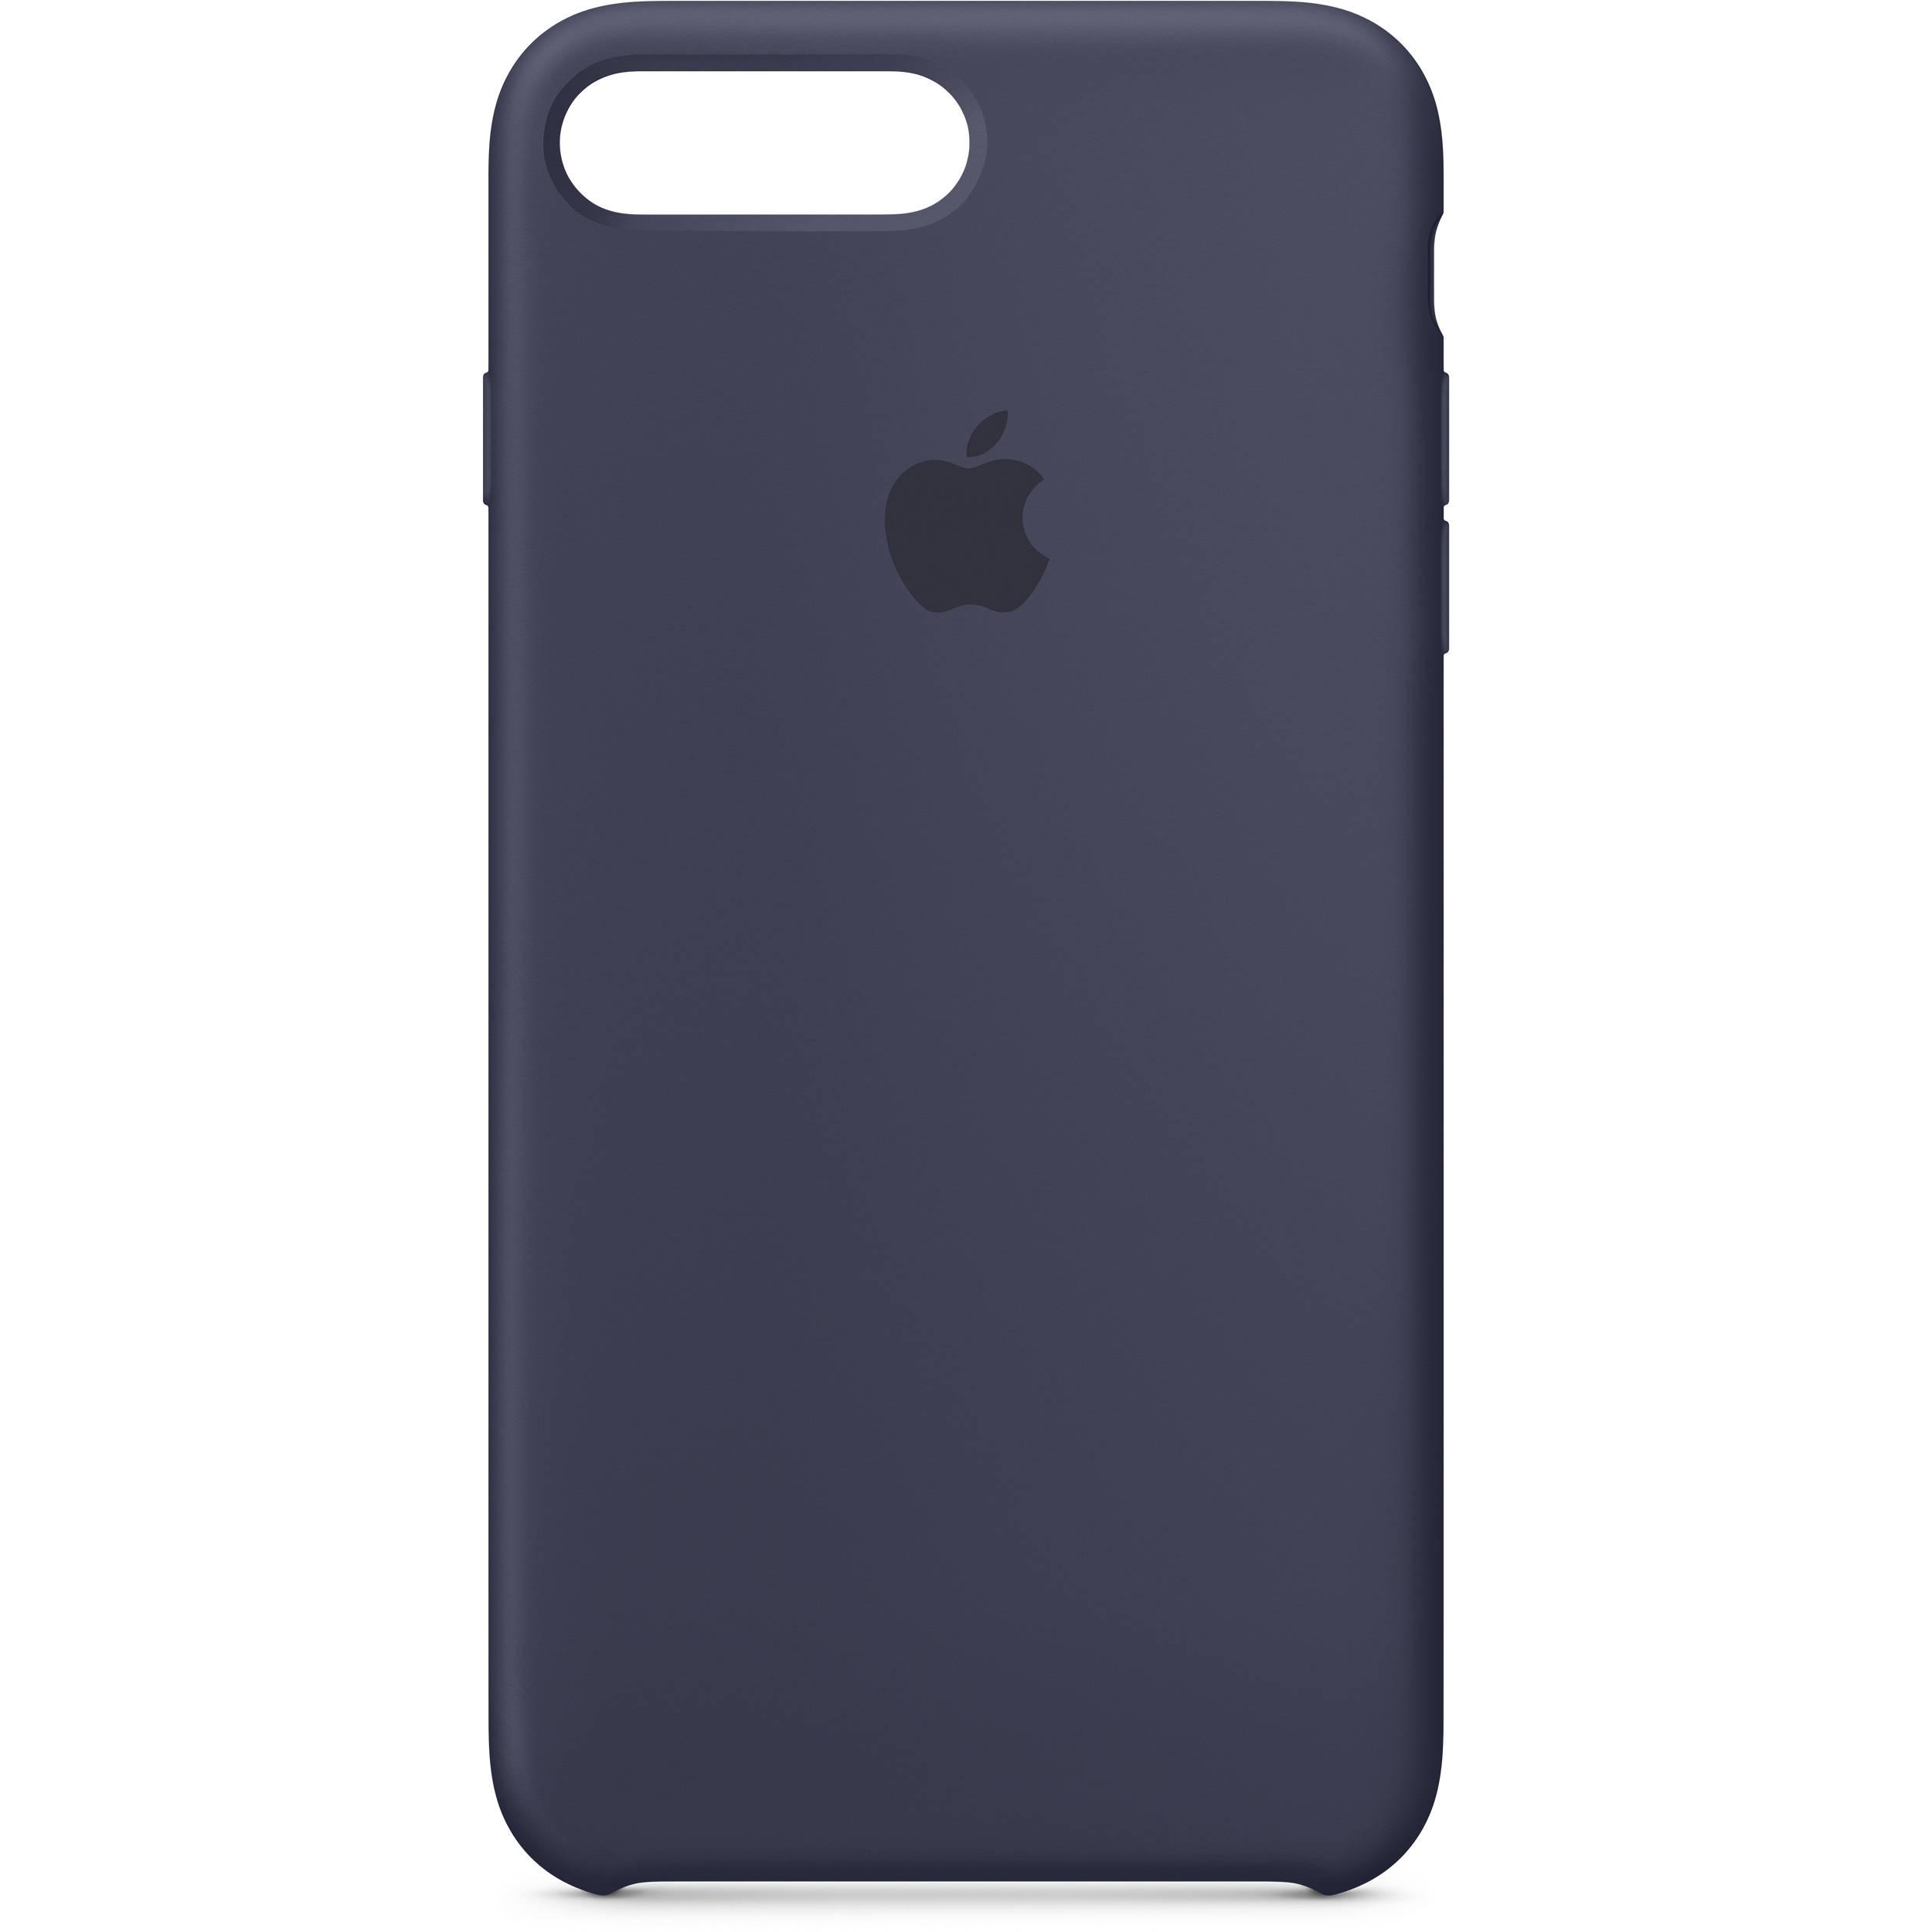 Apple Iphone 7 Plus 8 Plus Silicone Case Mqgy2zm A B H Photo